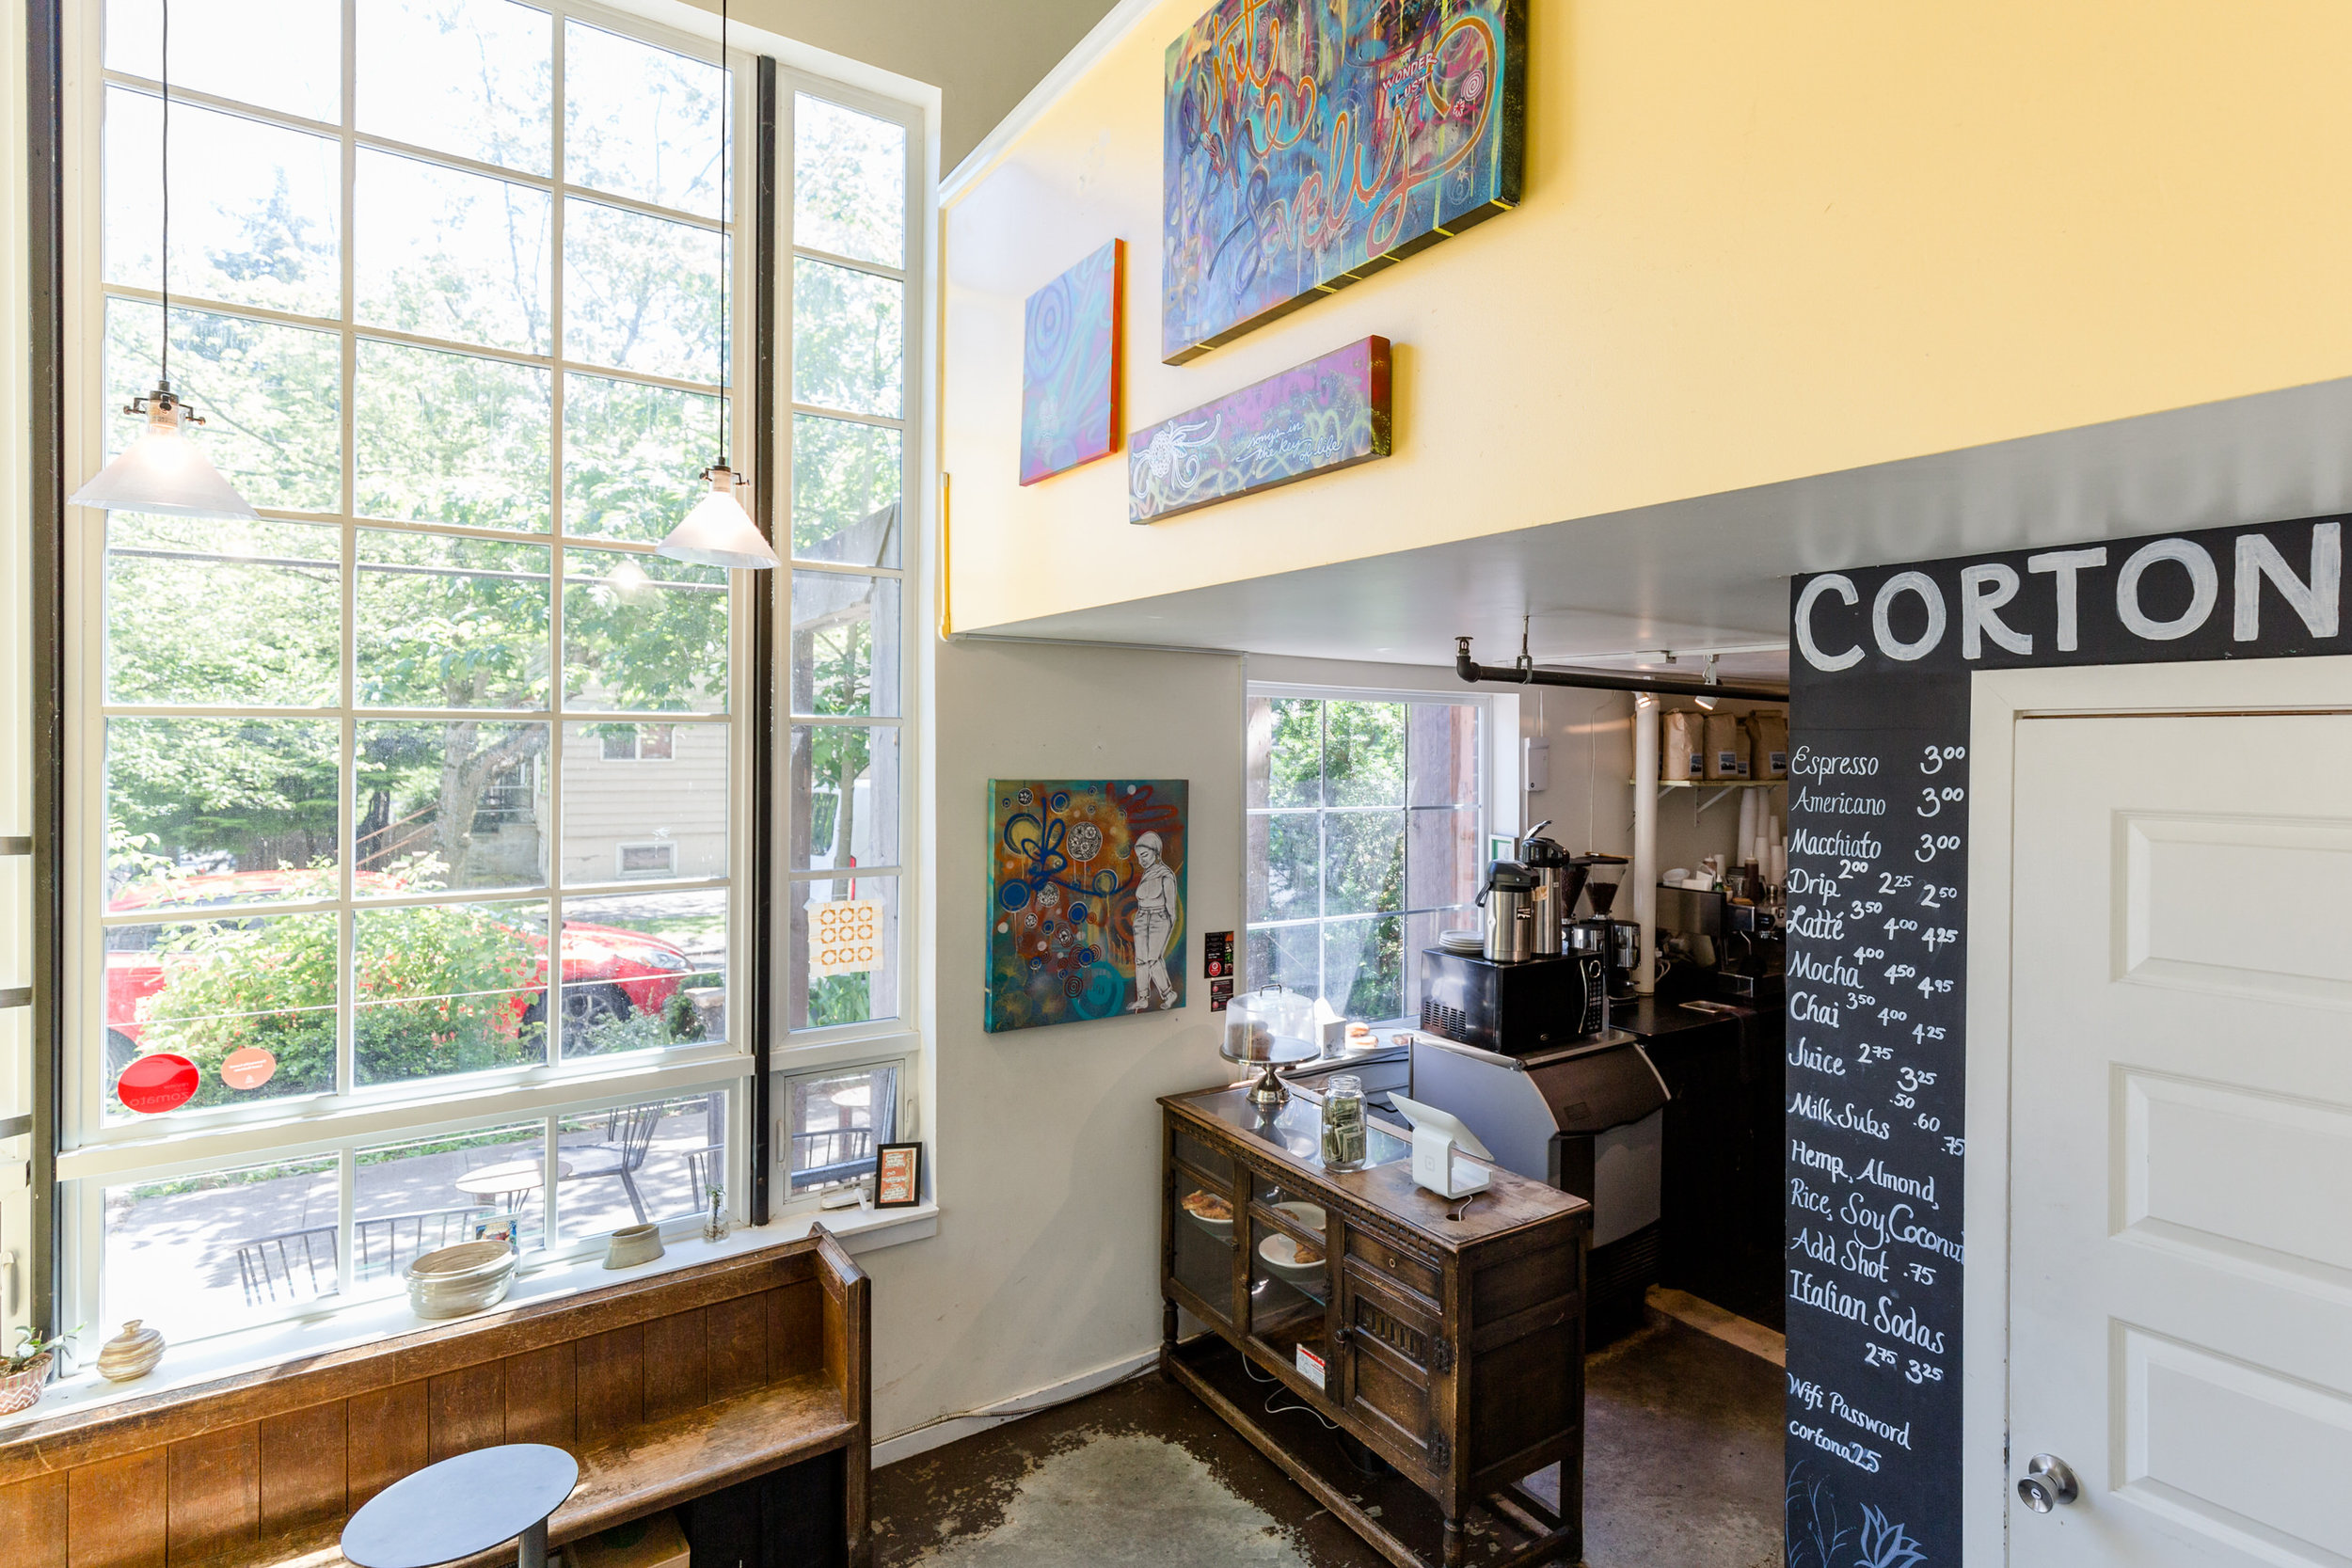 Cortona Coffee Shop